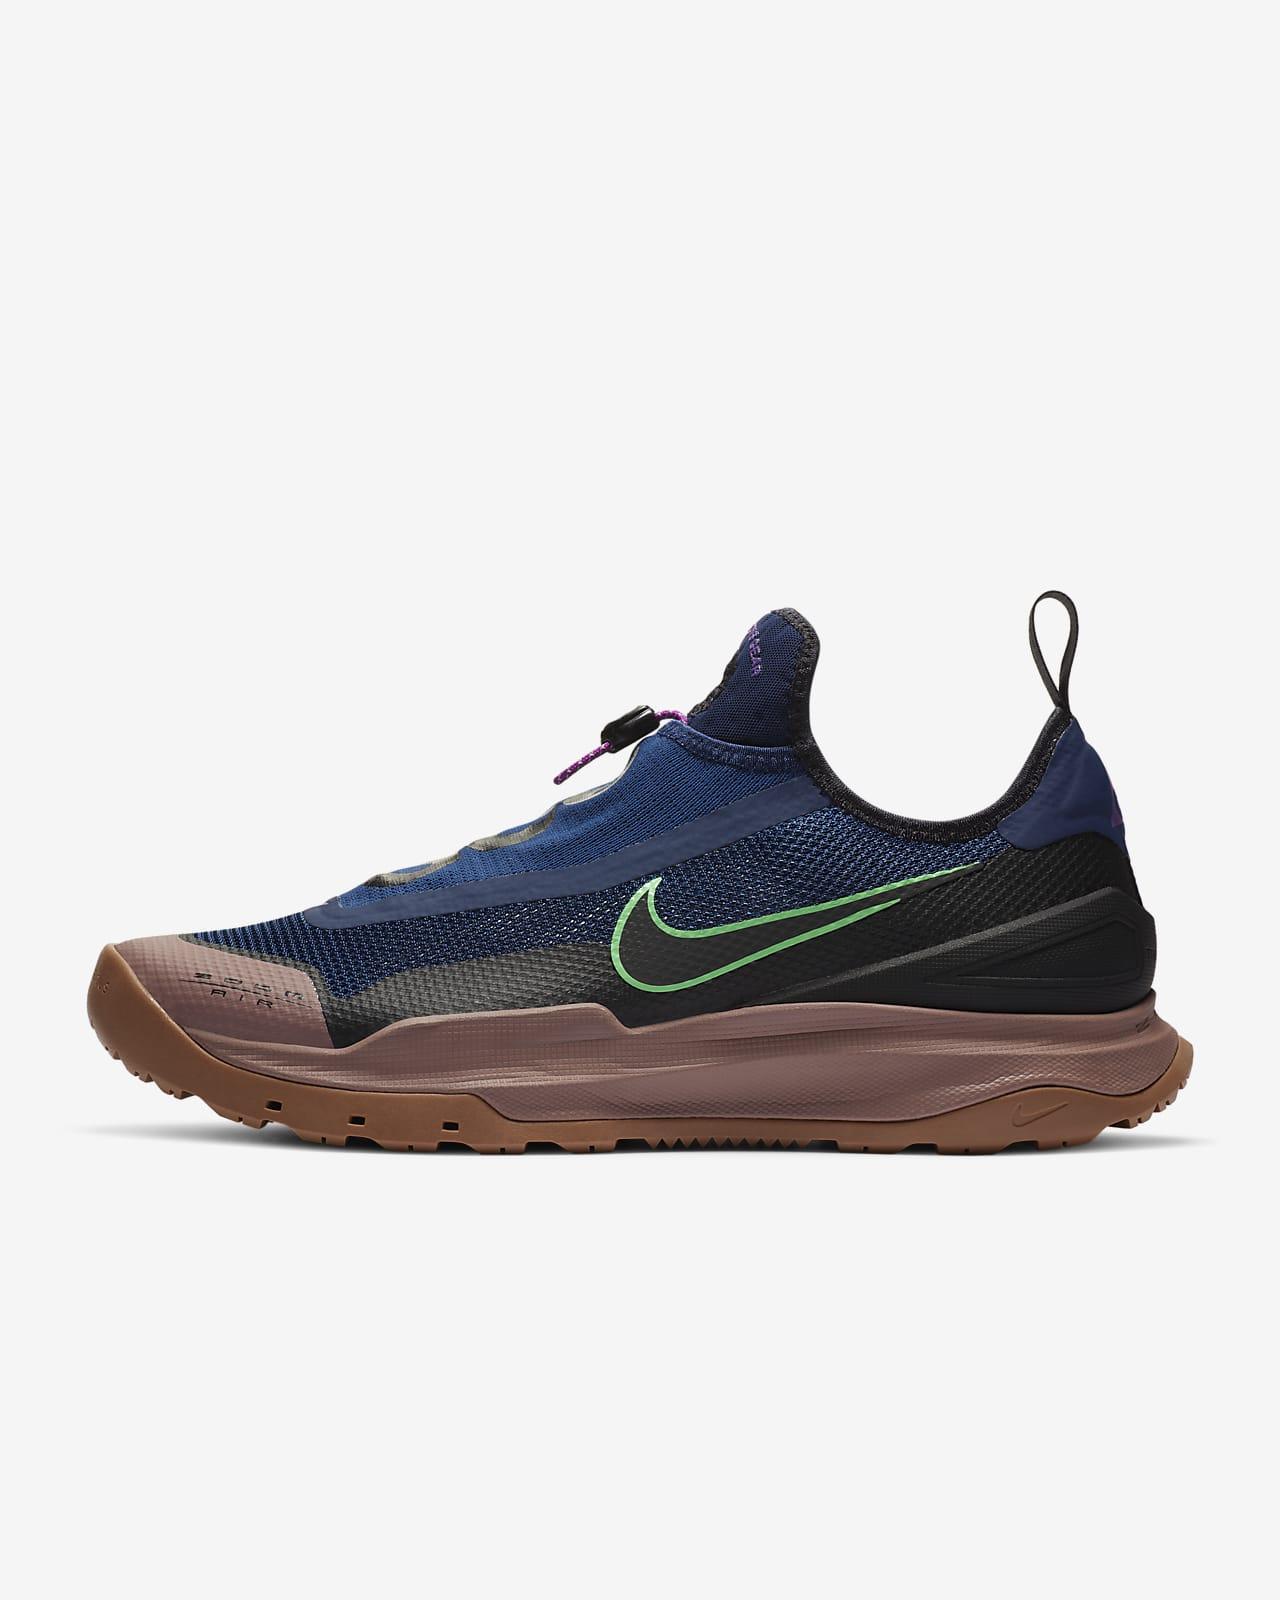 Chaussure de randonnée Nike ACG Zoom Air AO